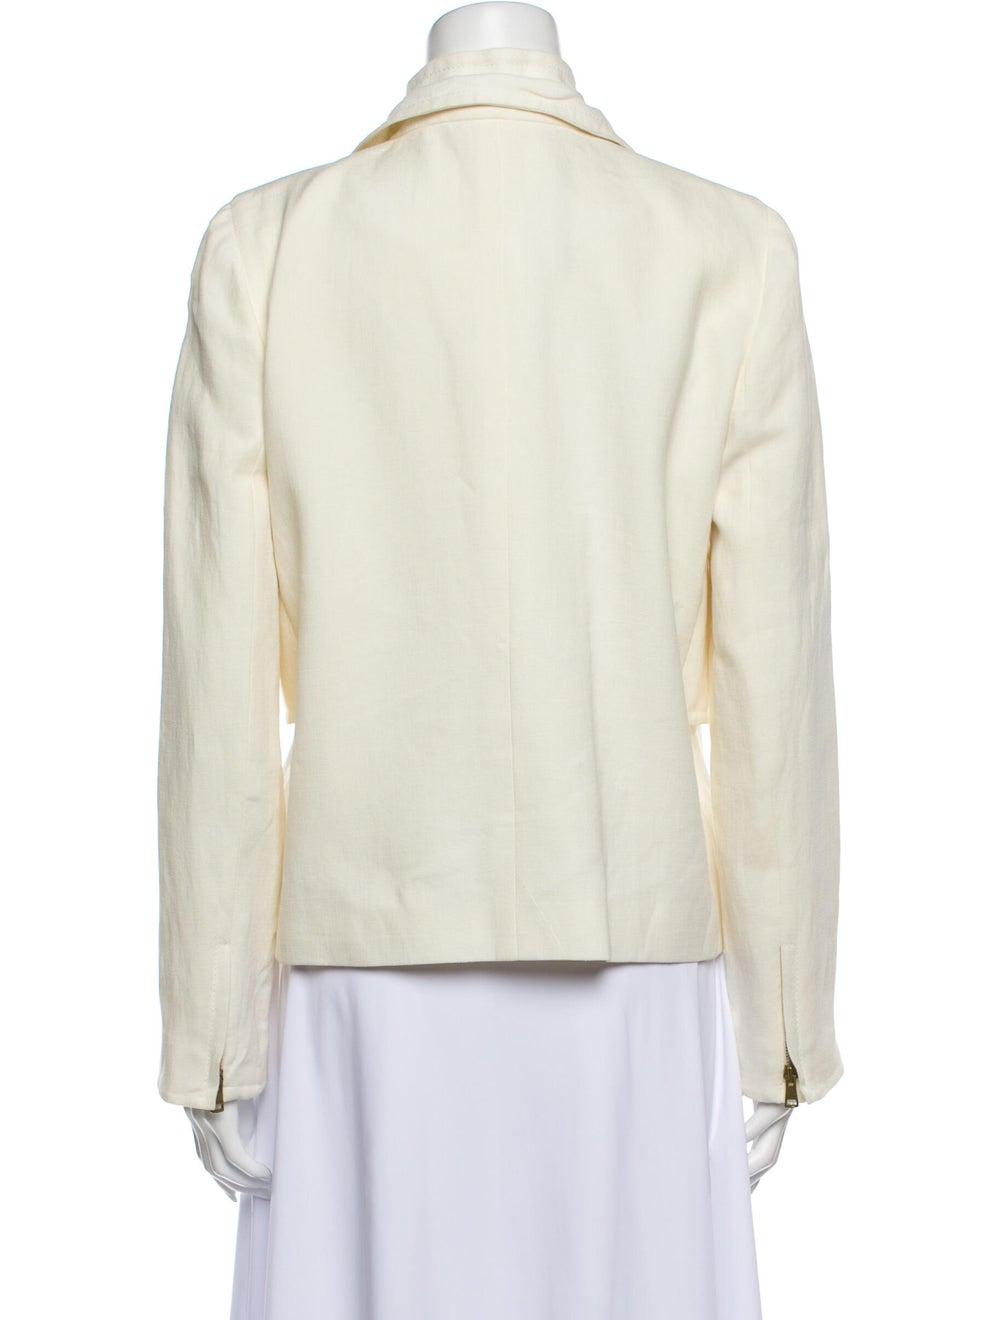 Gucci Linen Jacket - image 3